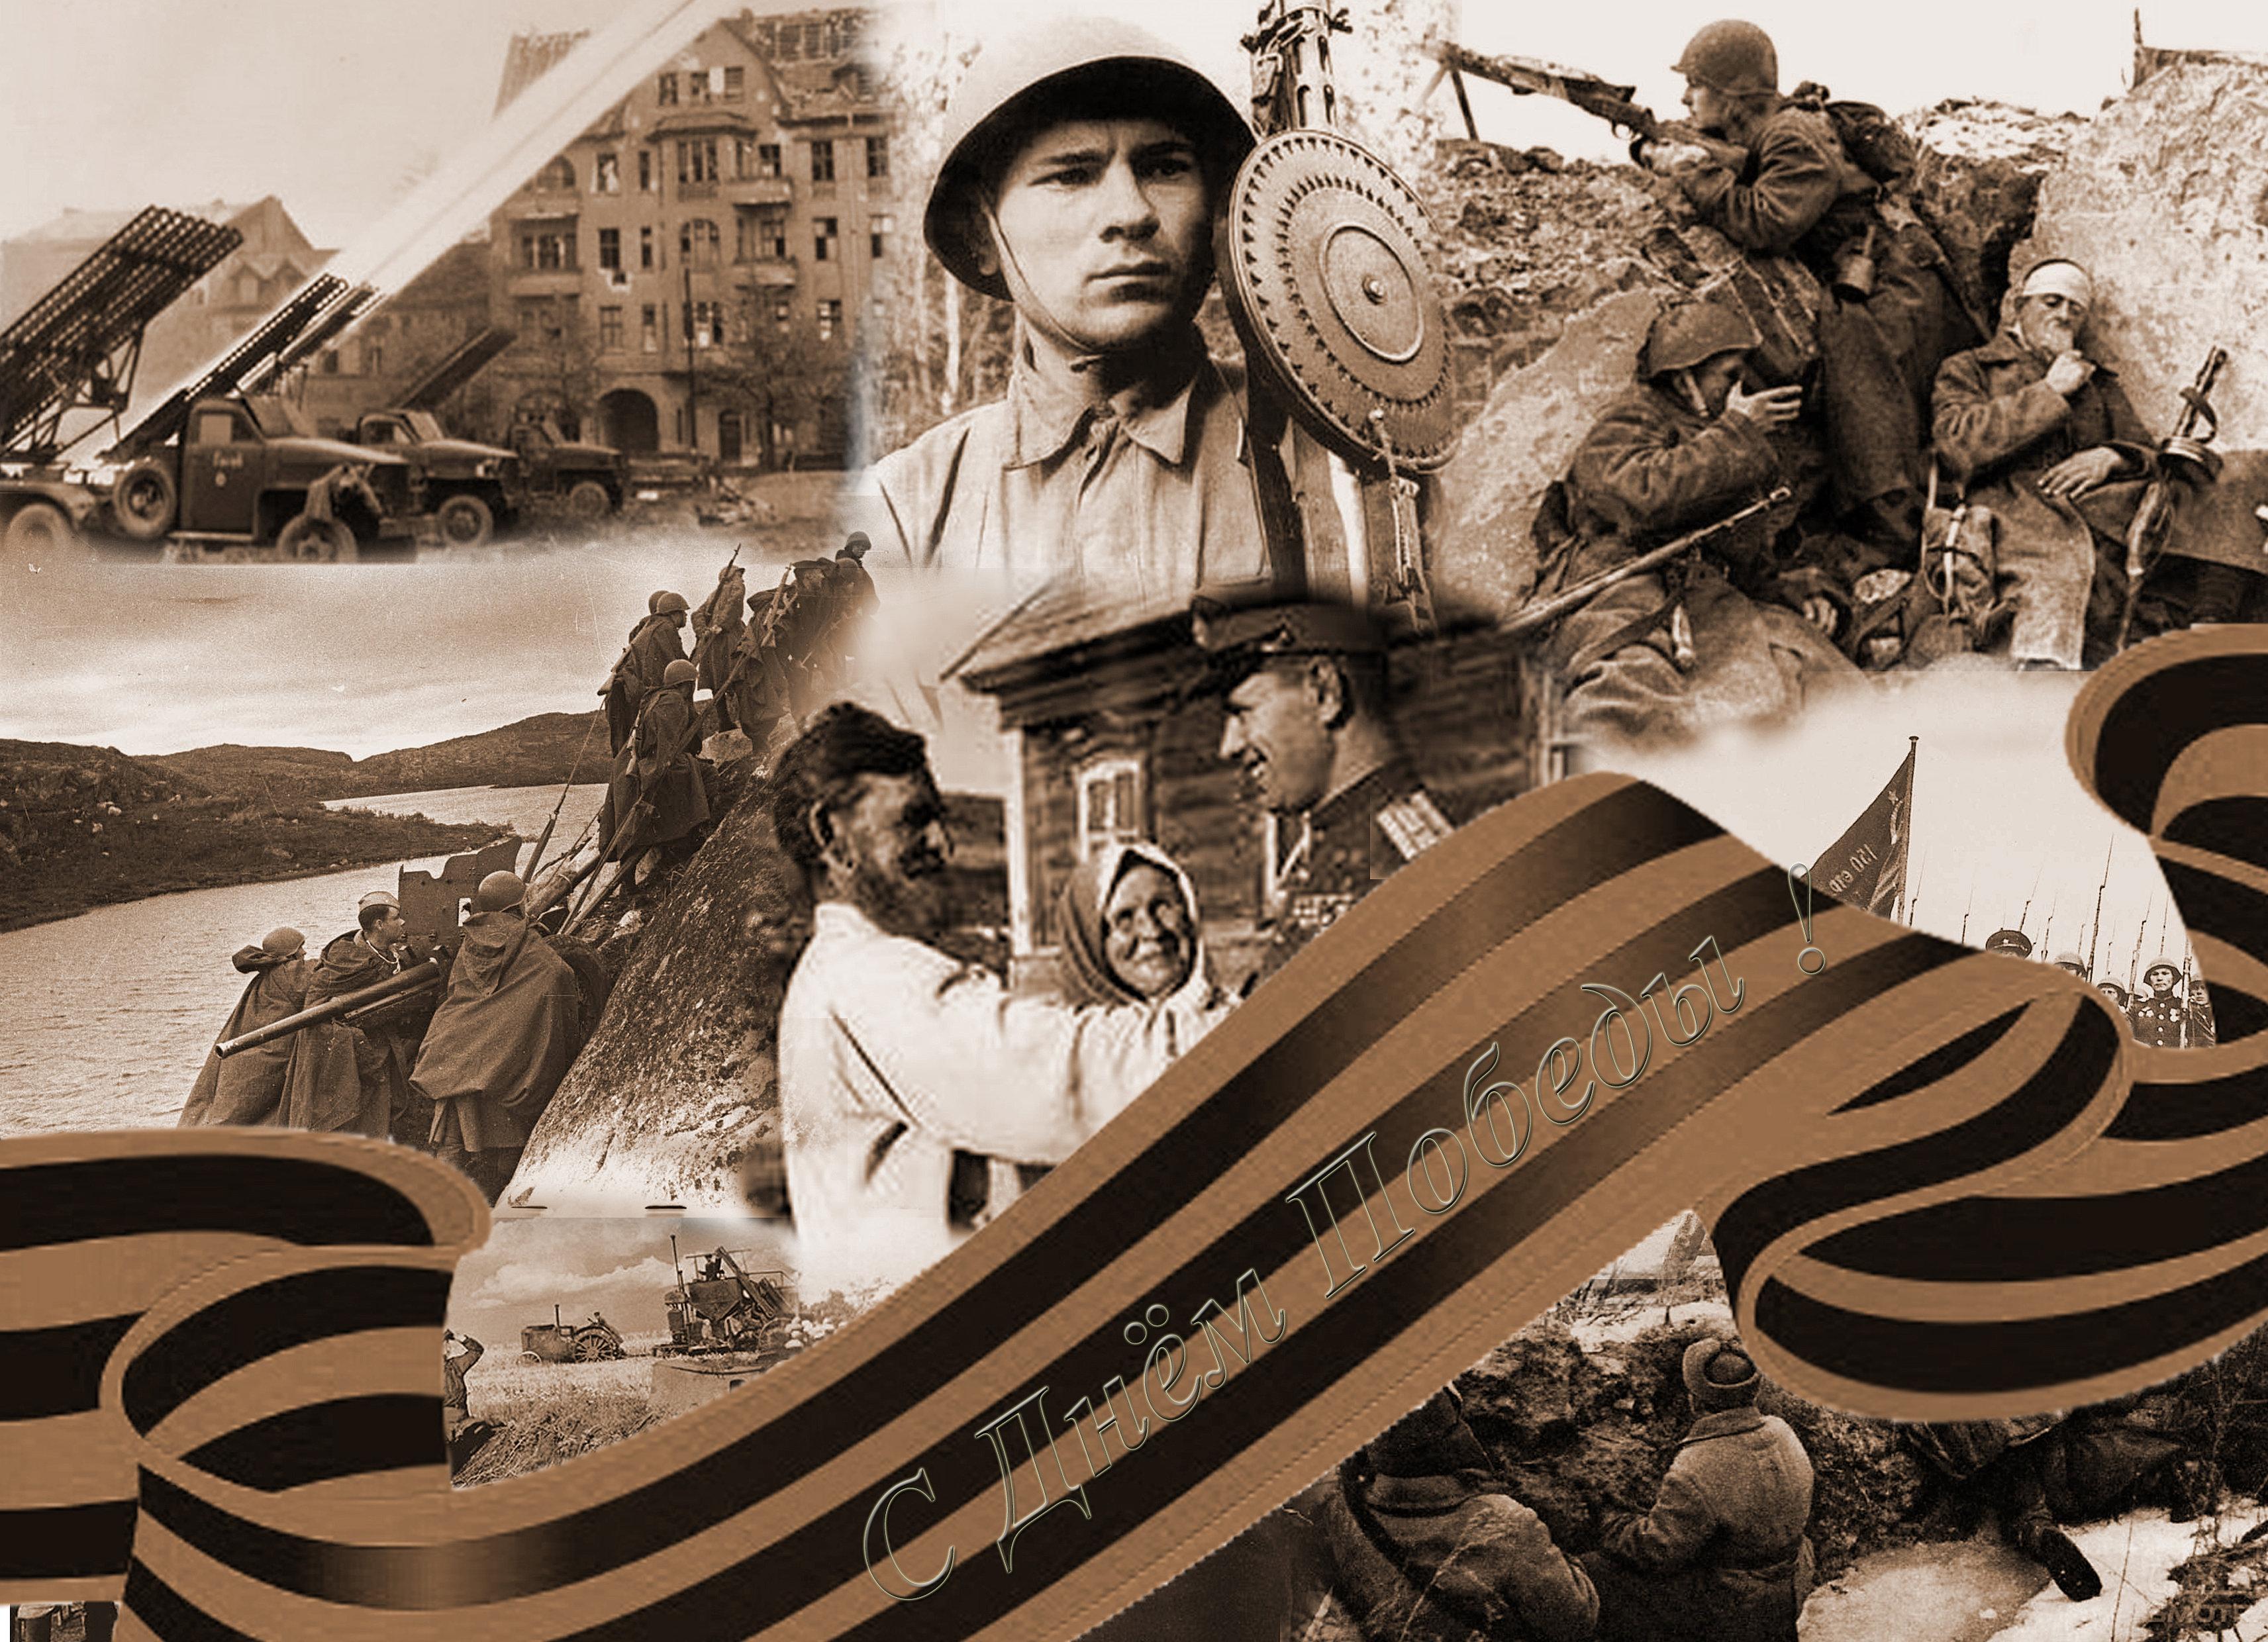 Коллаж из старых открыток 9 мая